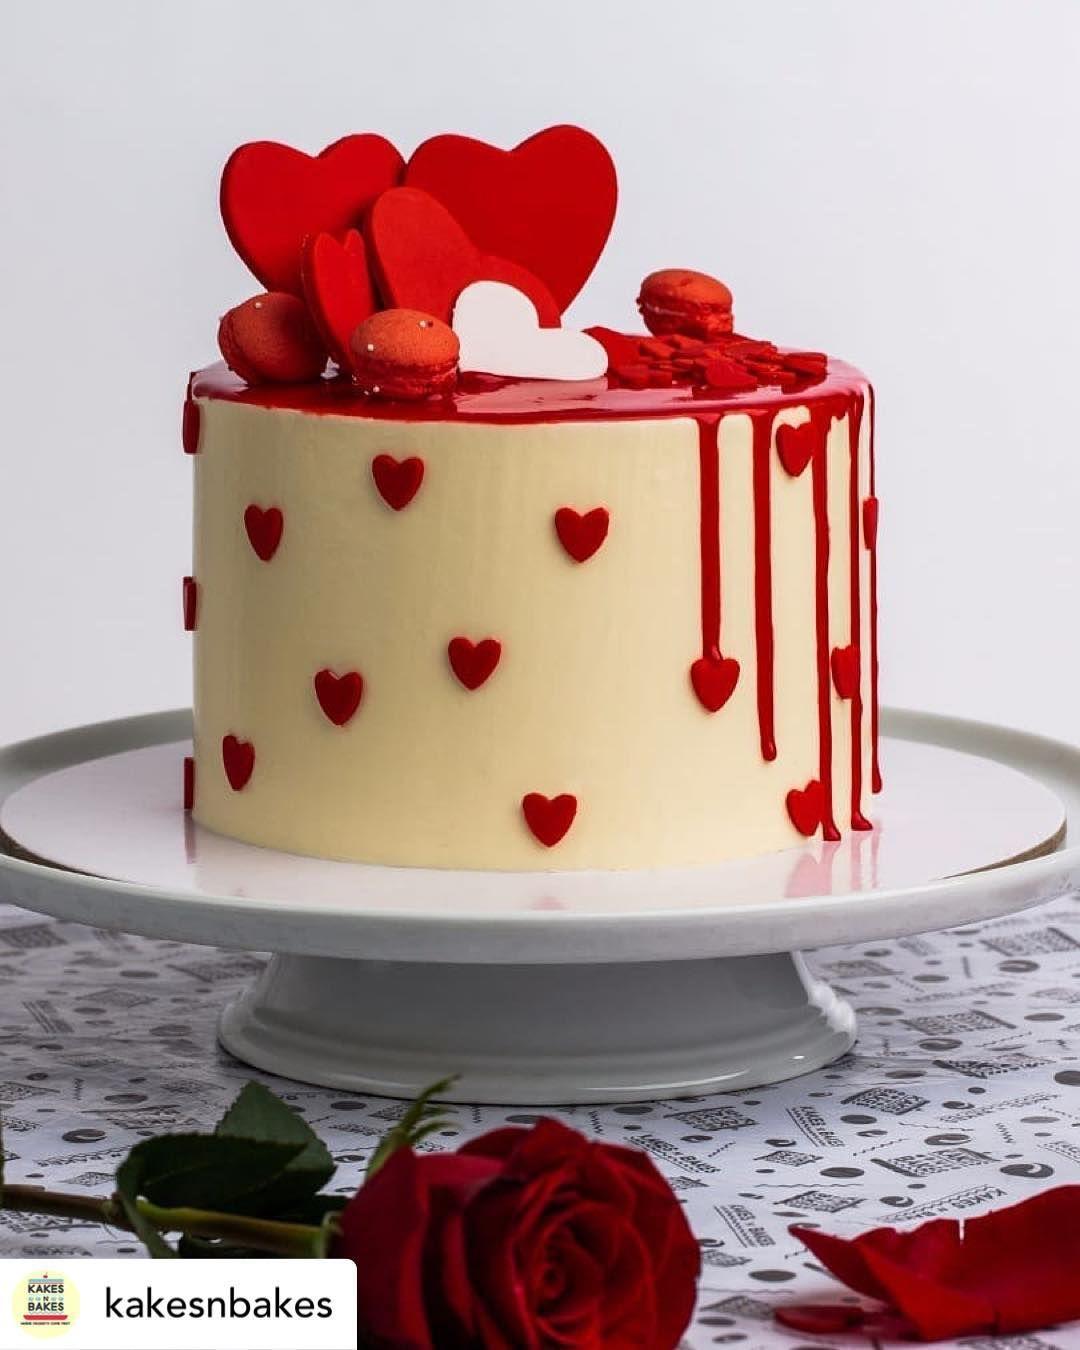 Cake S World On Instagram Caketutorial كيك كاب كيك كوكي كوكيز عيدميلاد عيدزواج عيد الأم تزیین کیک تزيين كوكيز Cake Valentine Cake Cake Decorating